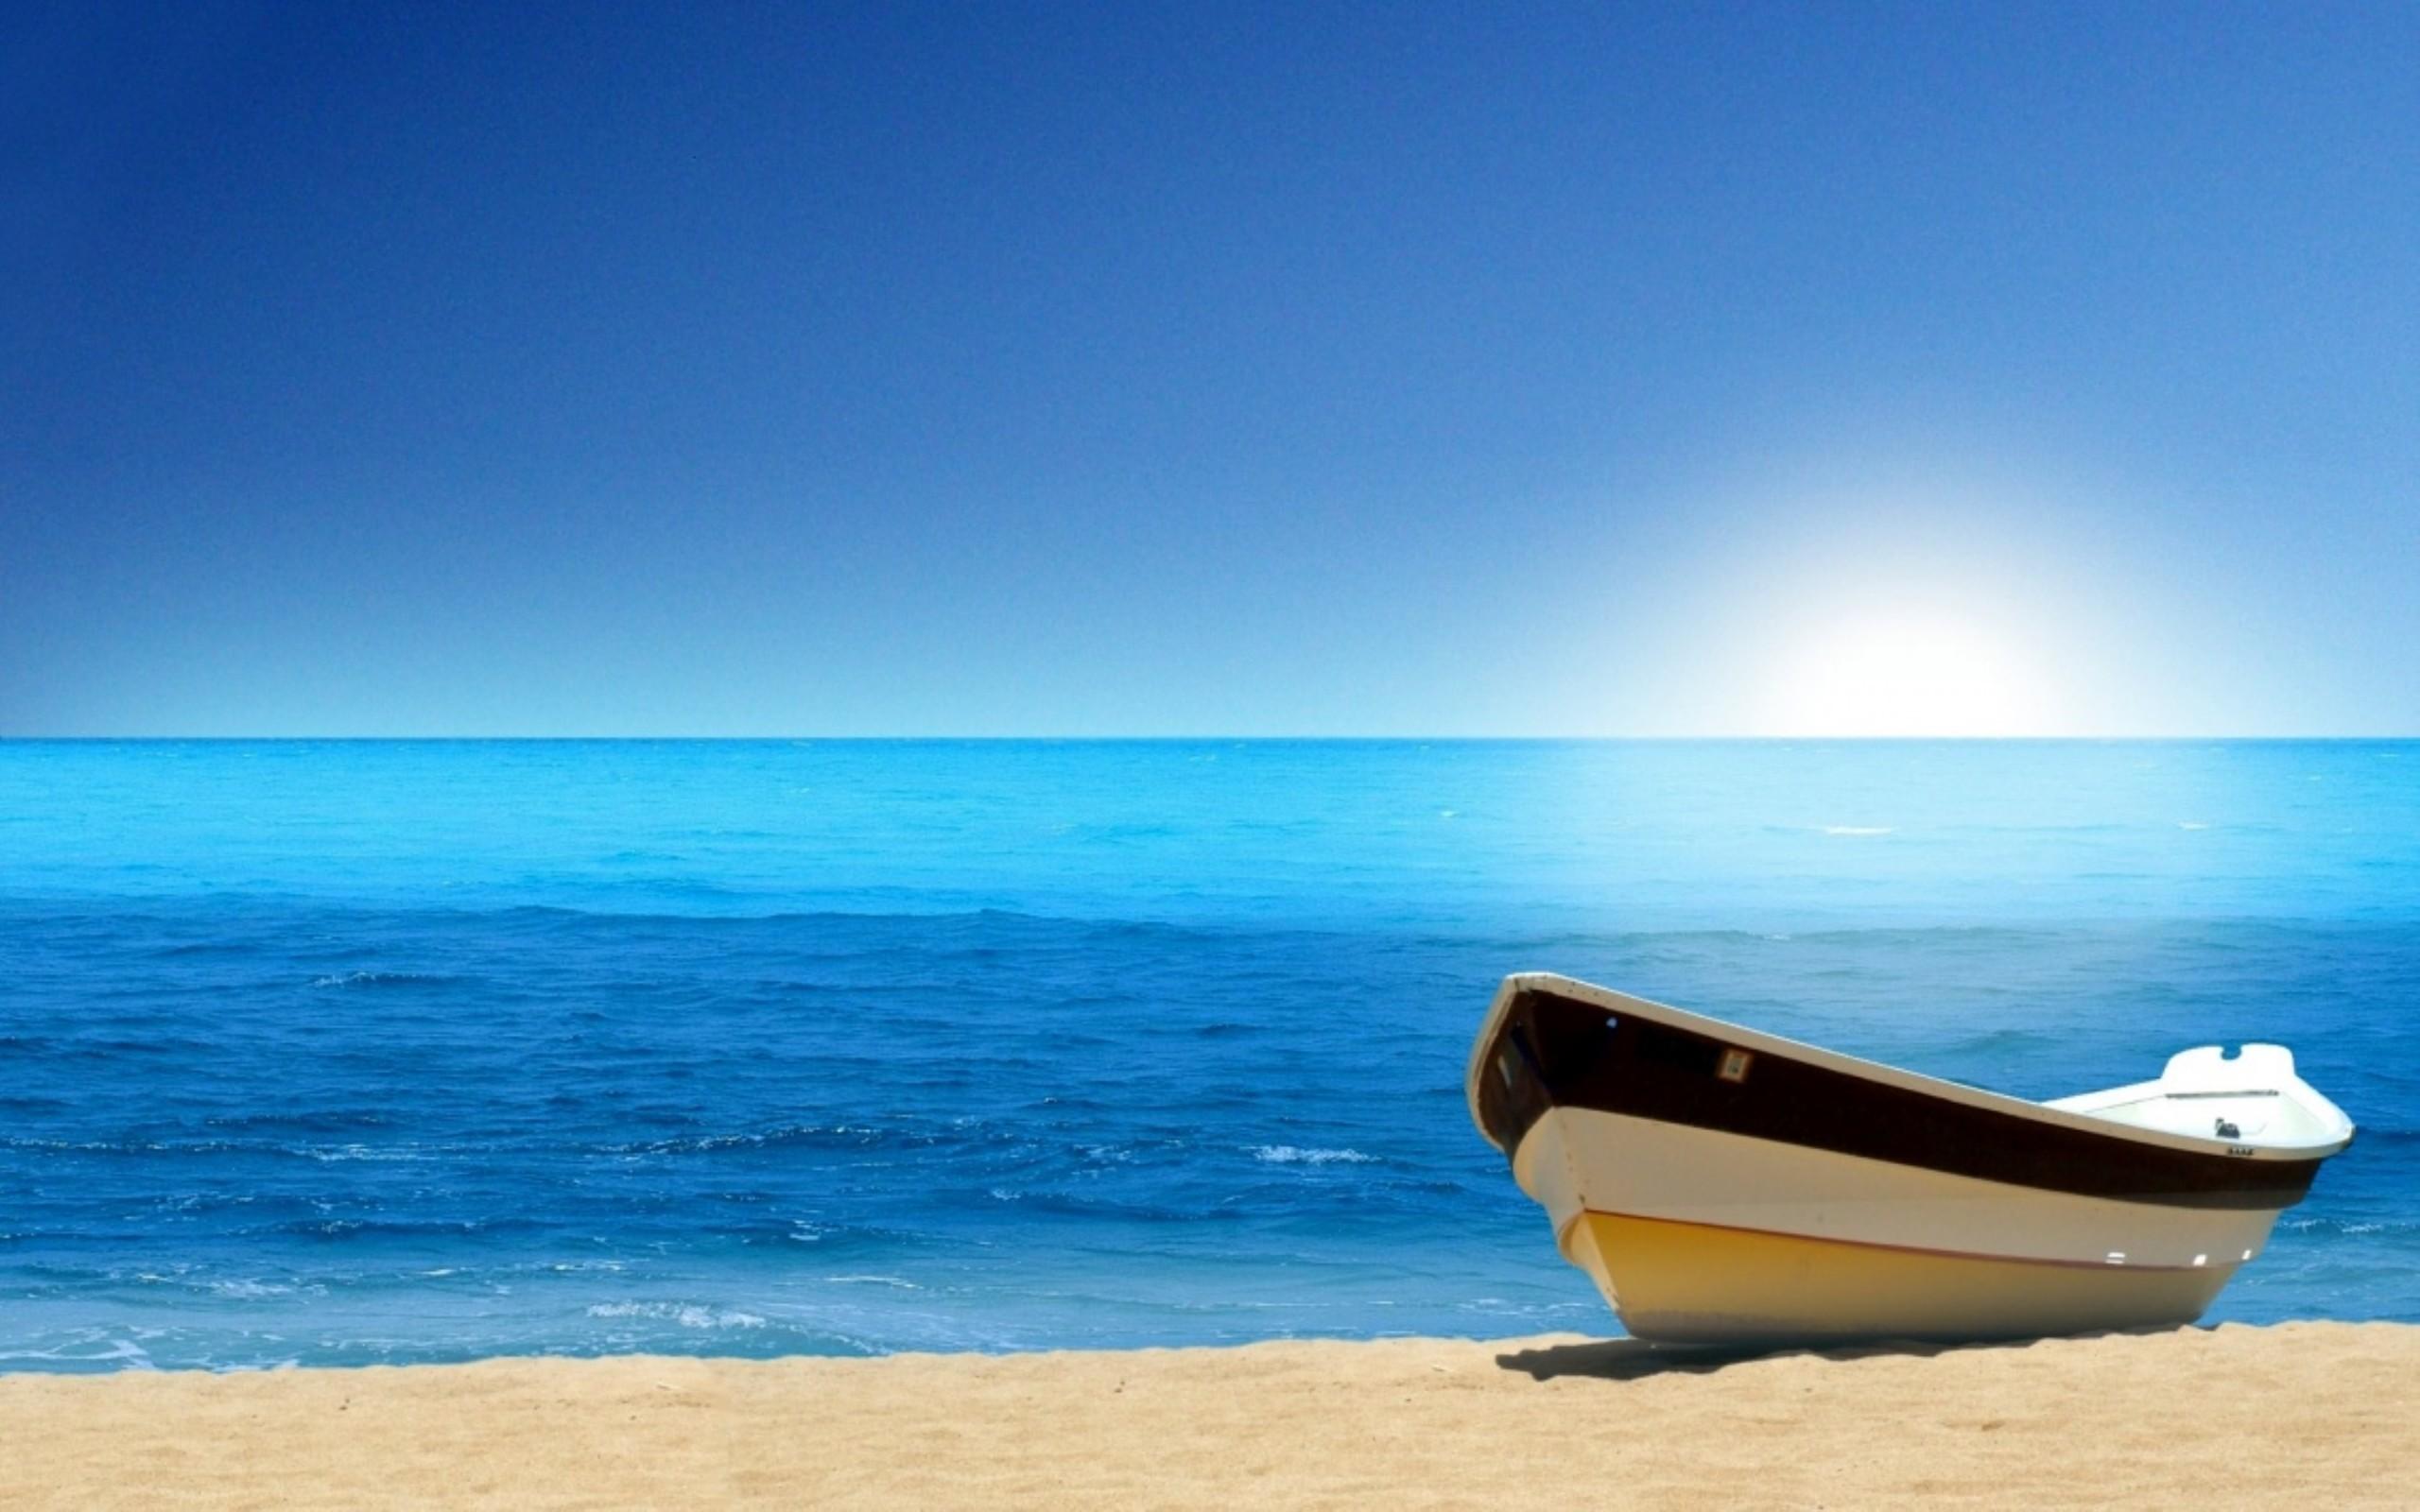 Boat Blue Ocean Beach Wallpaper.